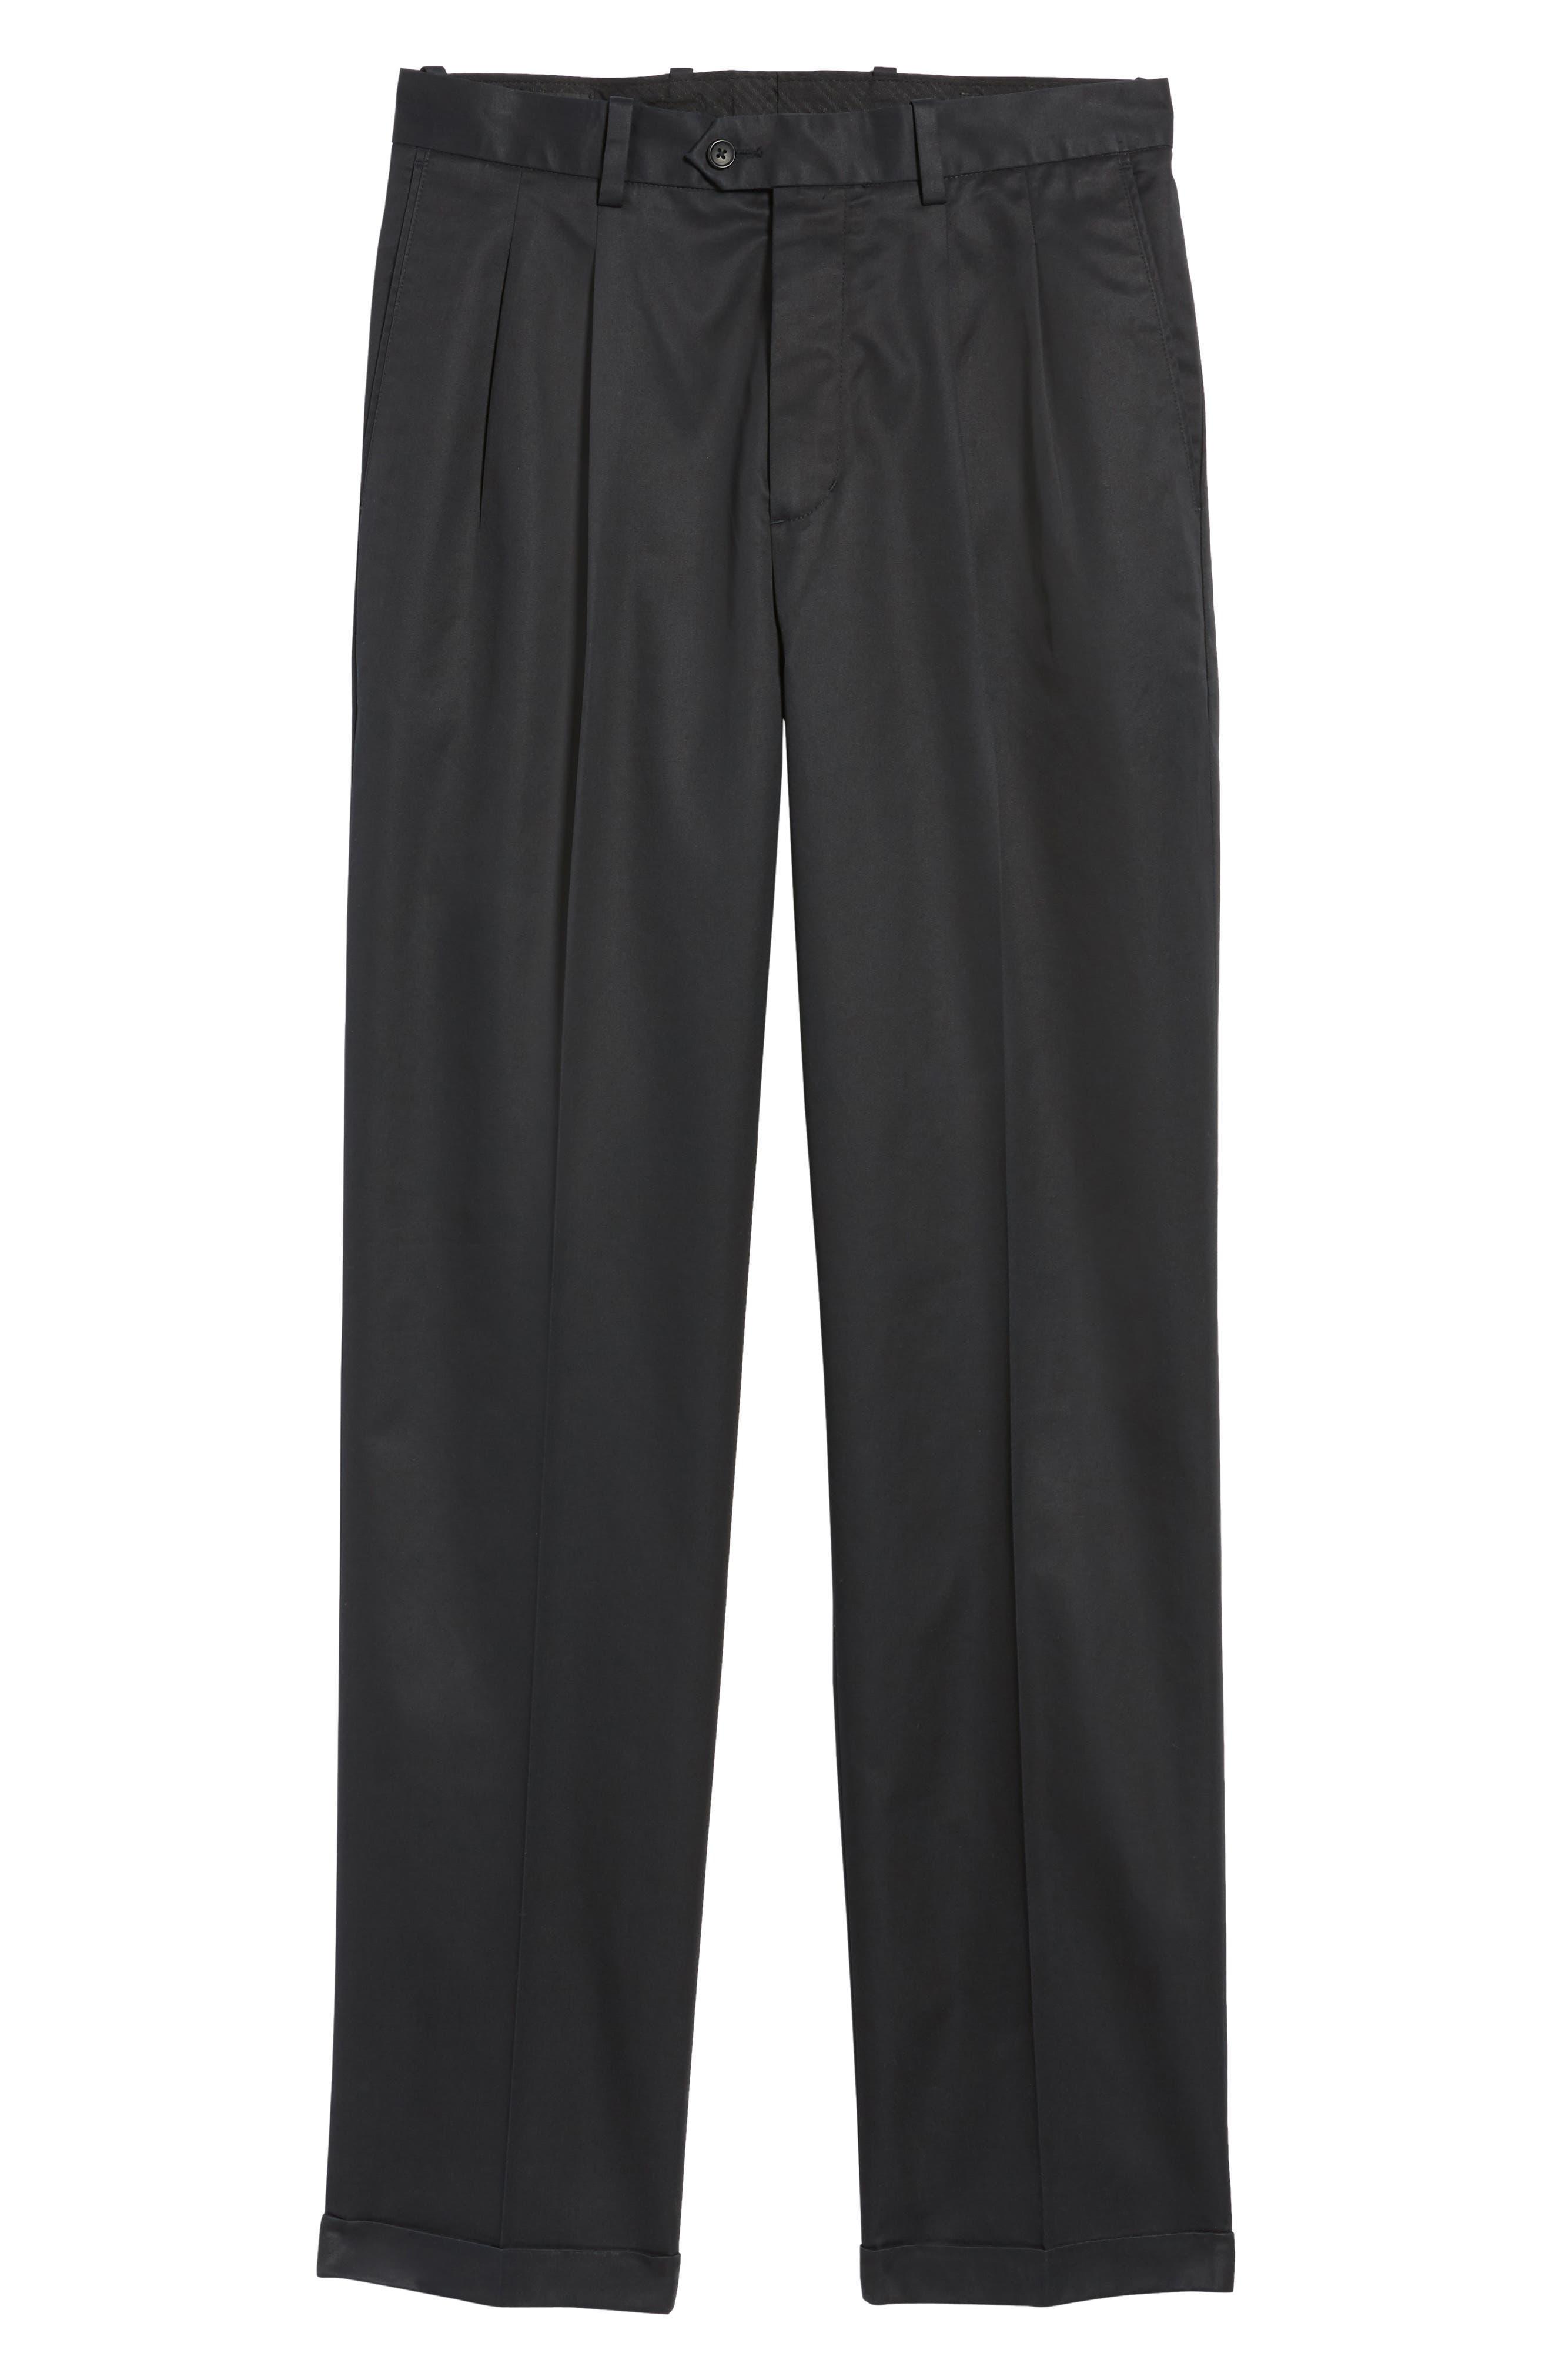 NORDSTROM MEN'S SHOP Classic Smartcare<sup>™</sup> Supima<sup>®</sup> Cotton Pleated Trousers, Main, color, BLACK CAVIAR